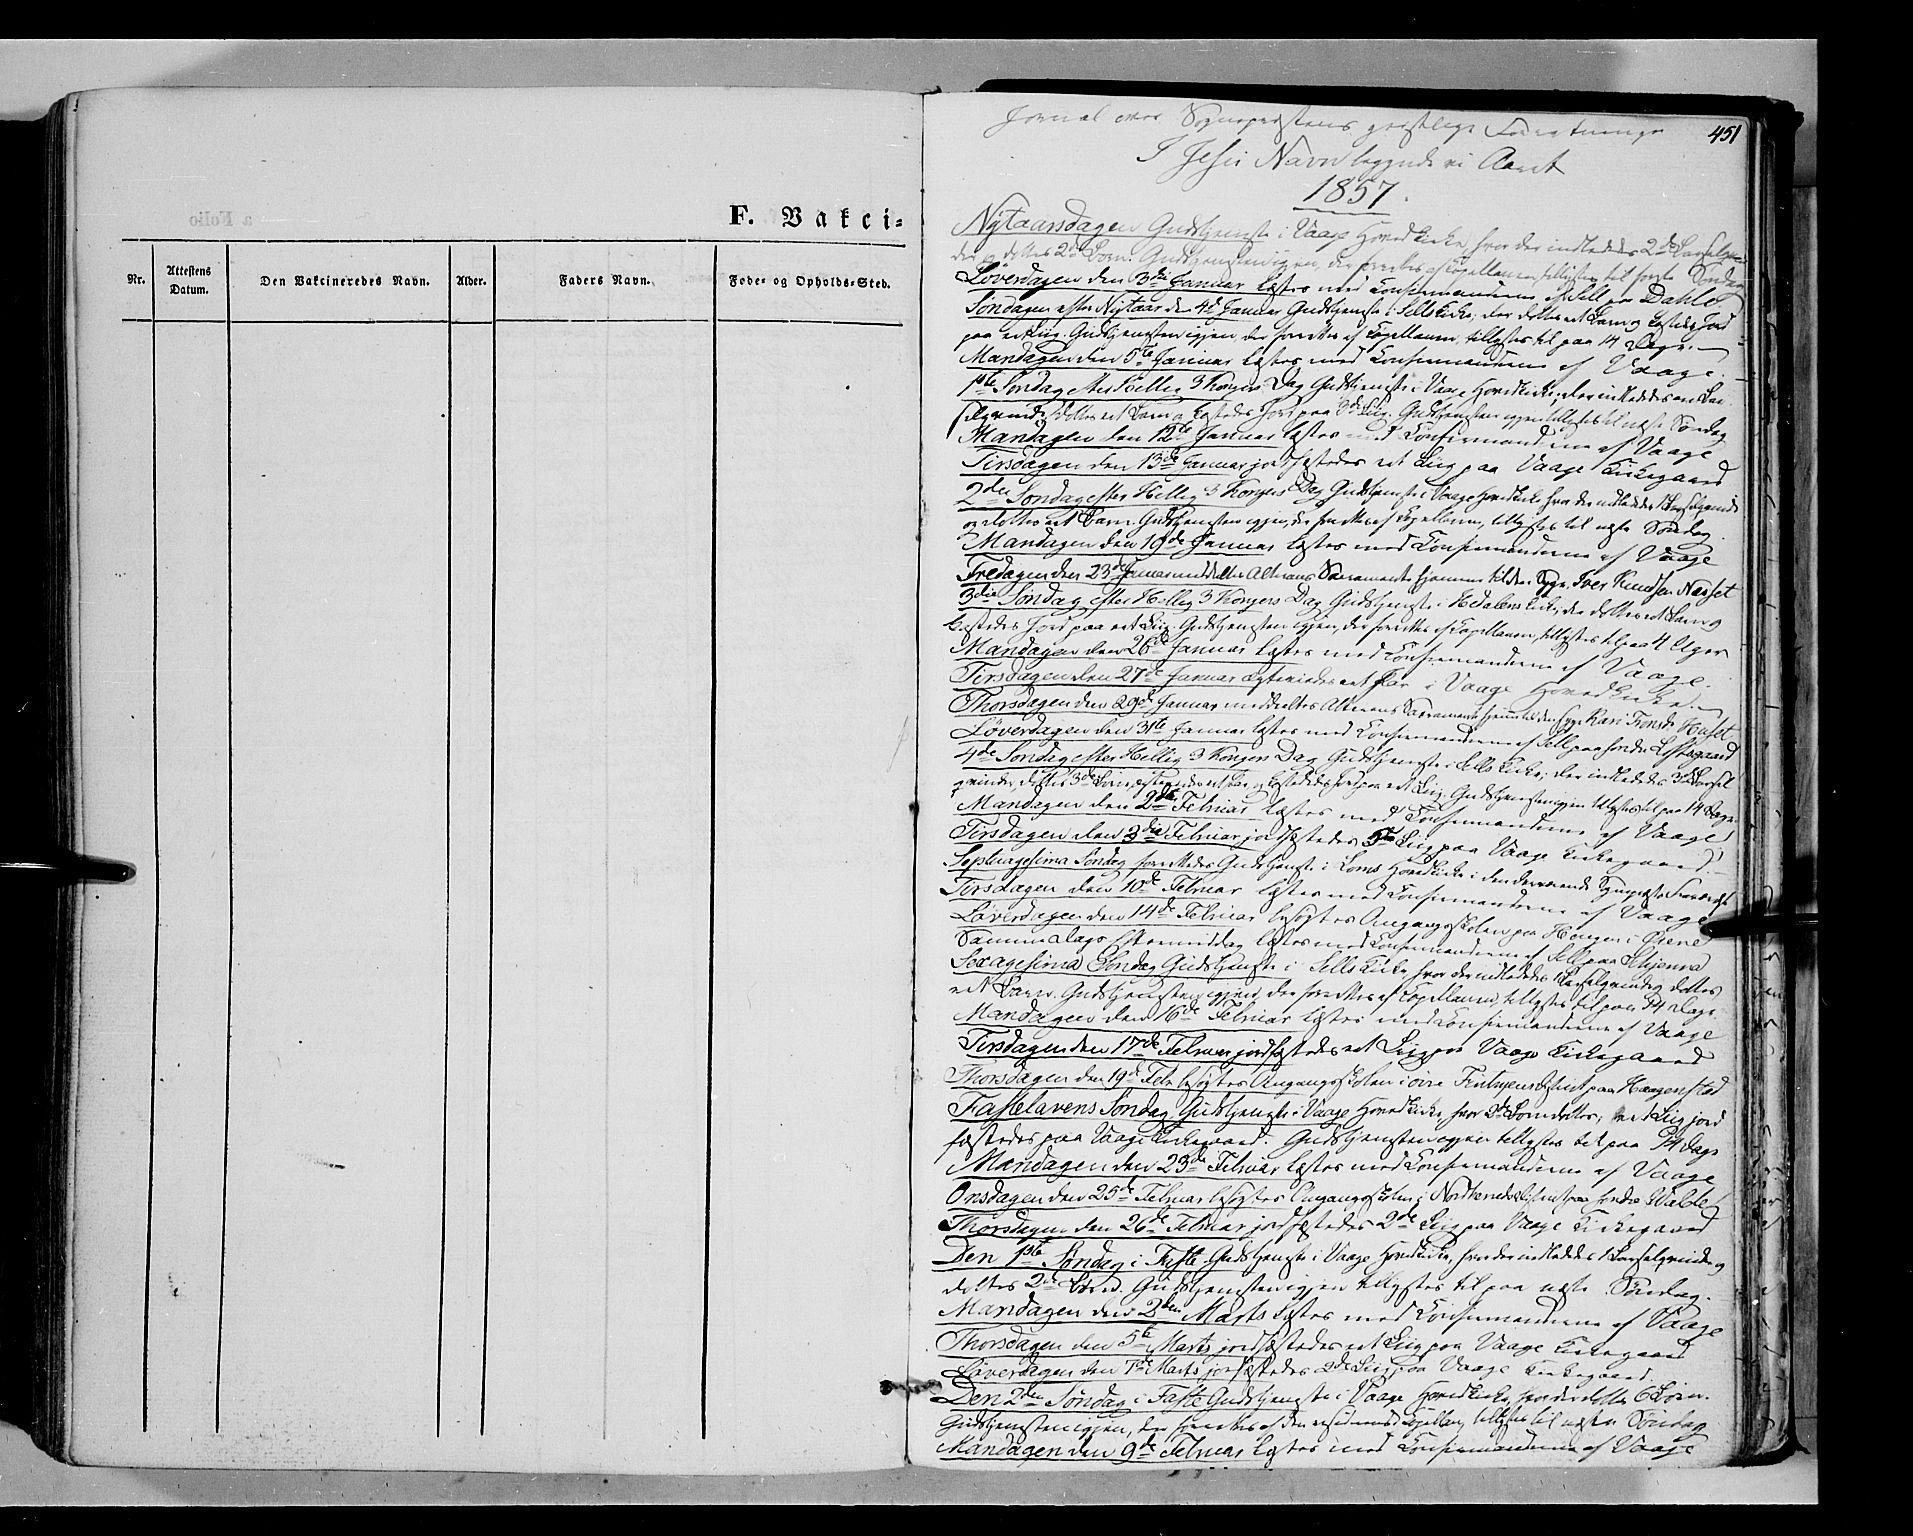 SAH, Vågå prestekontor, Ministerialbok nr. 6 /1, 1856-1872, s. 451